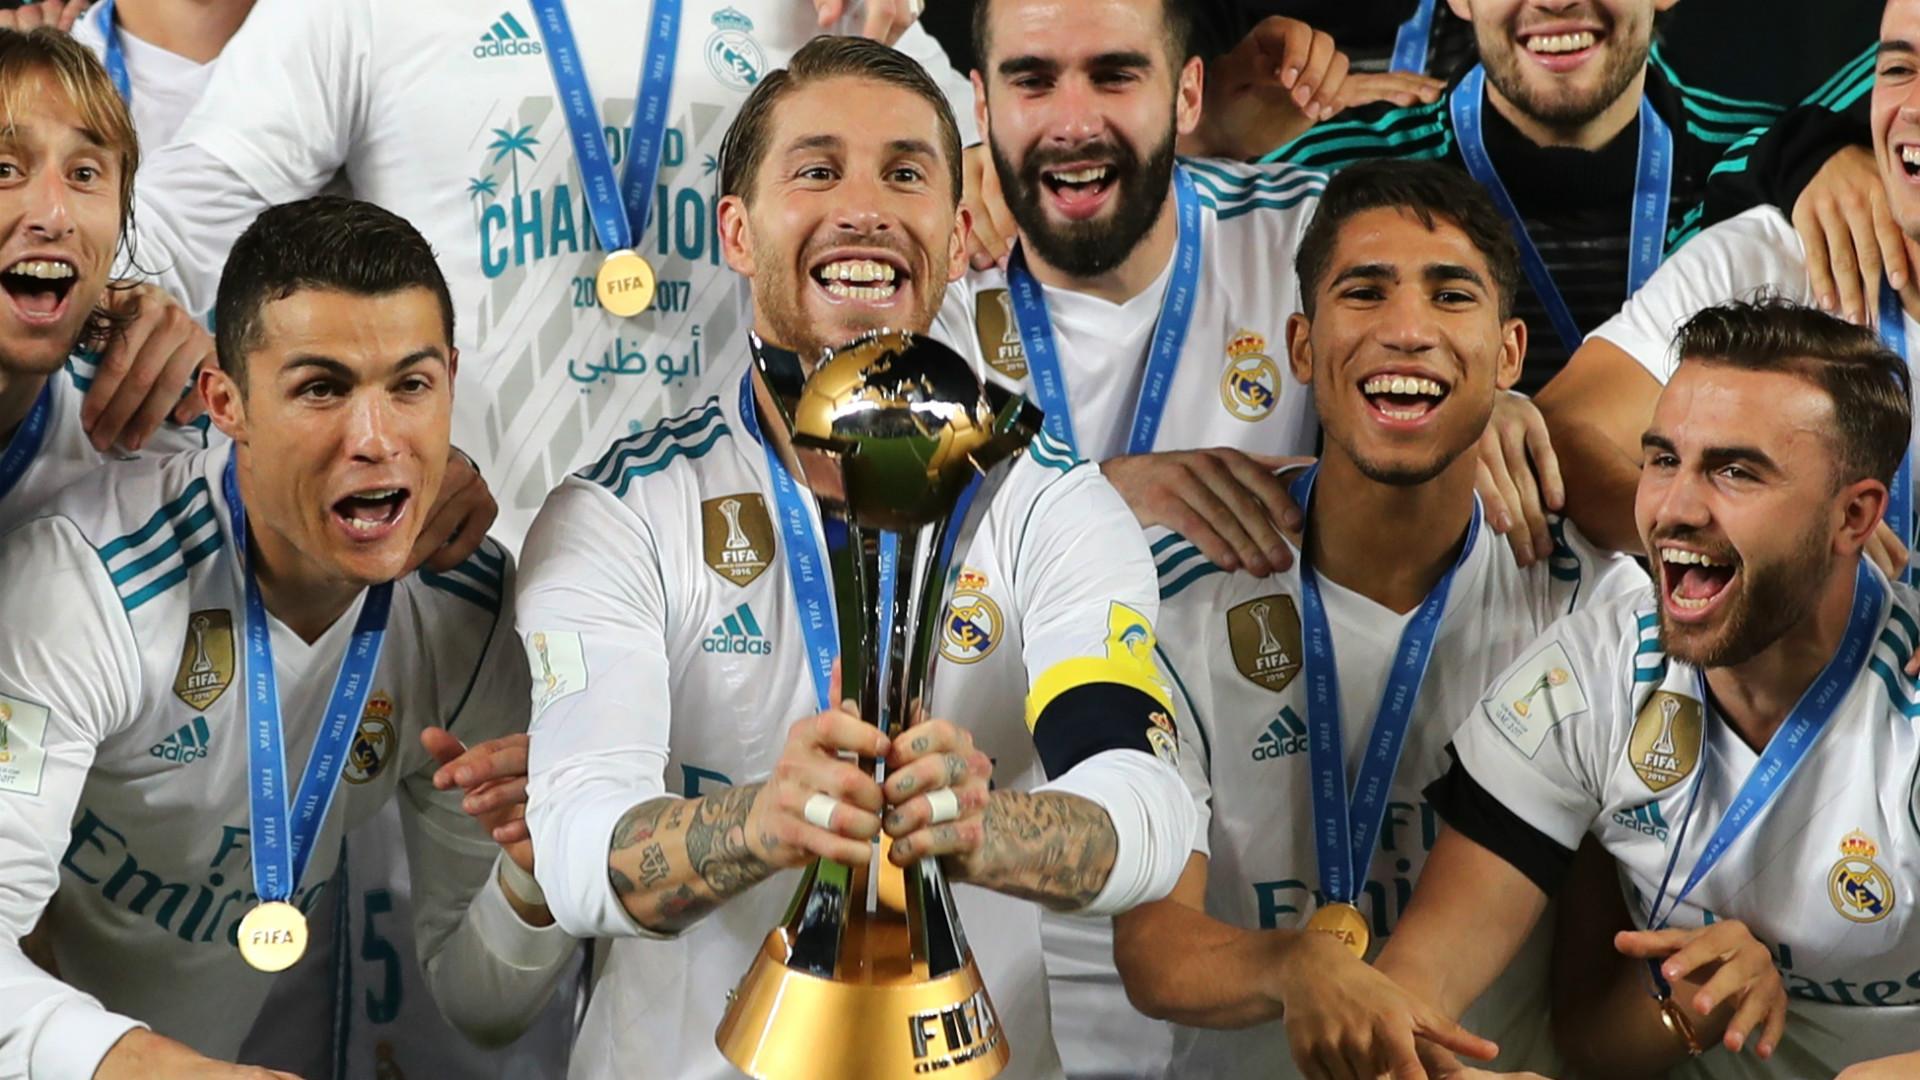 real-madrid-club-world-cup-2017_kh8lw8jt